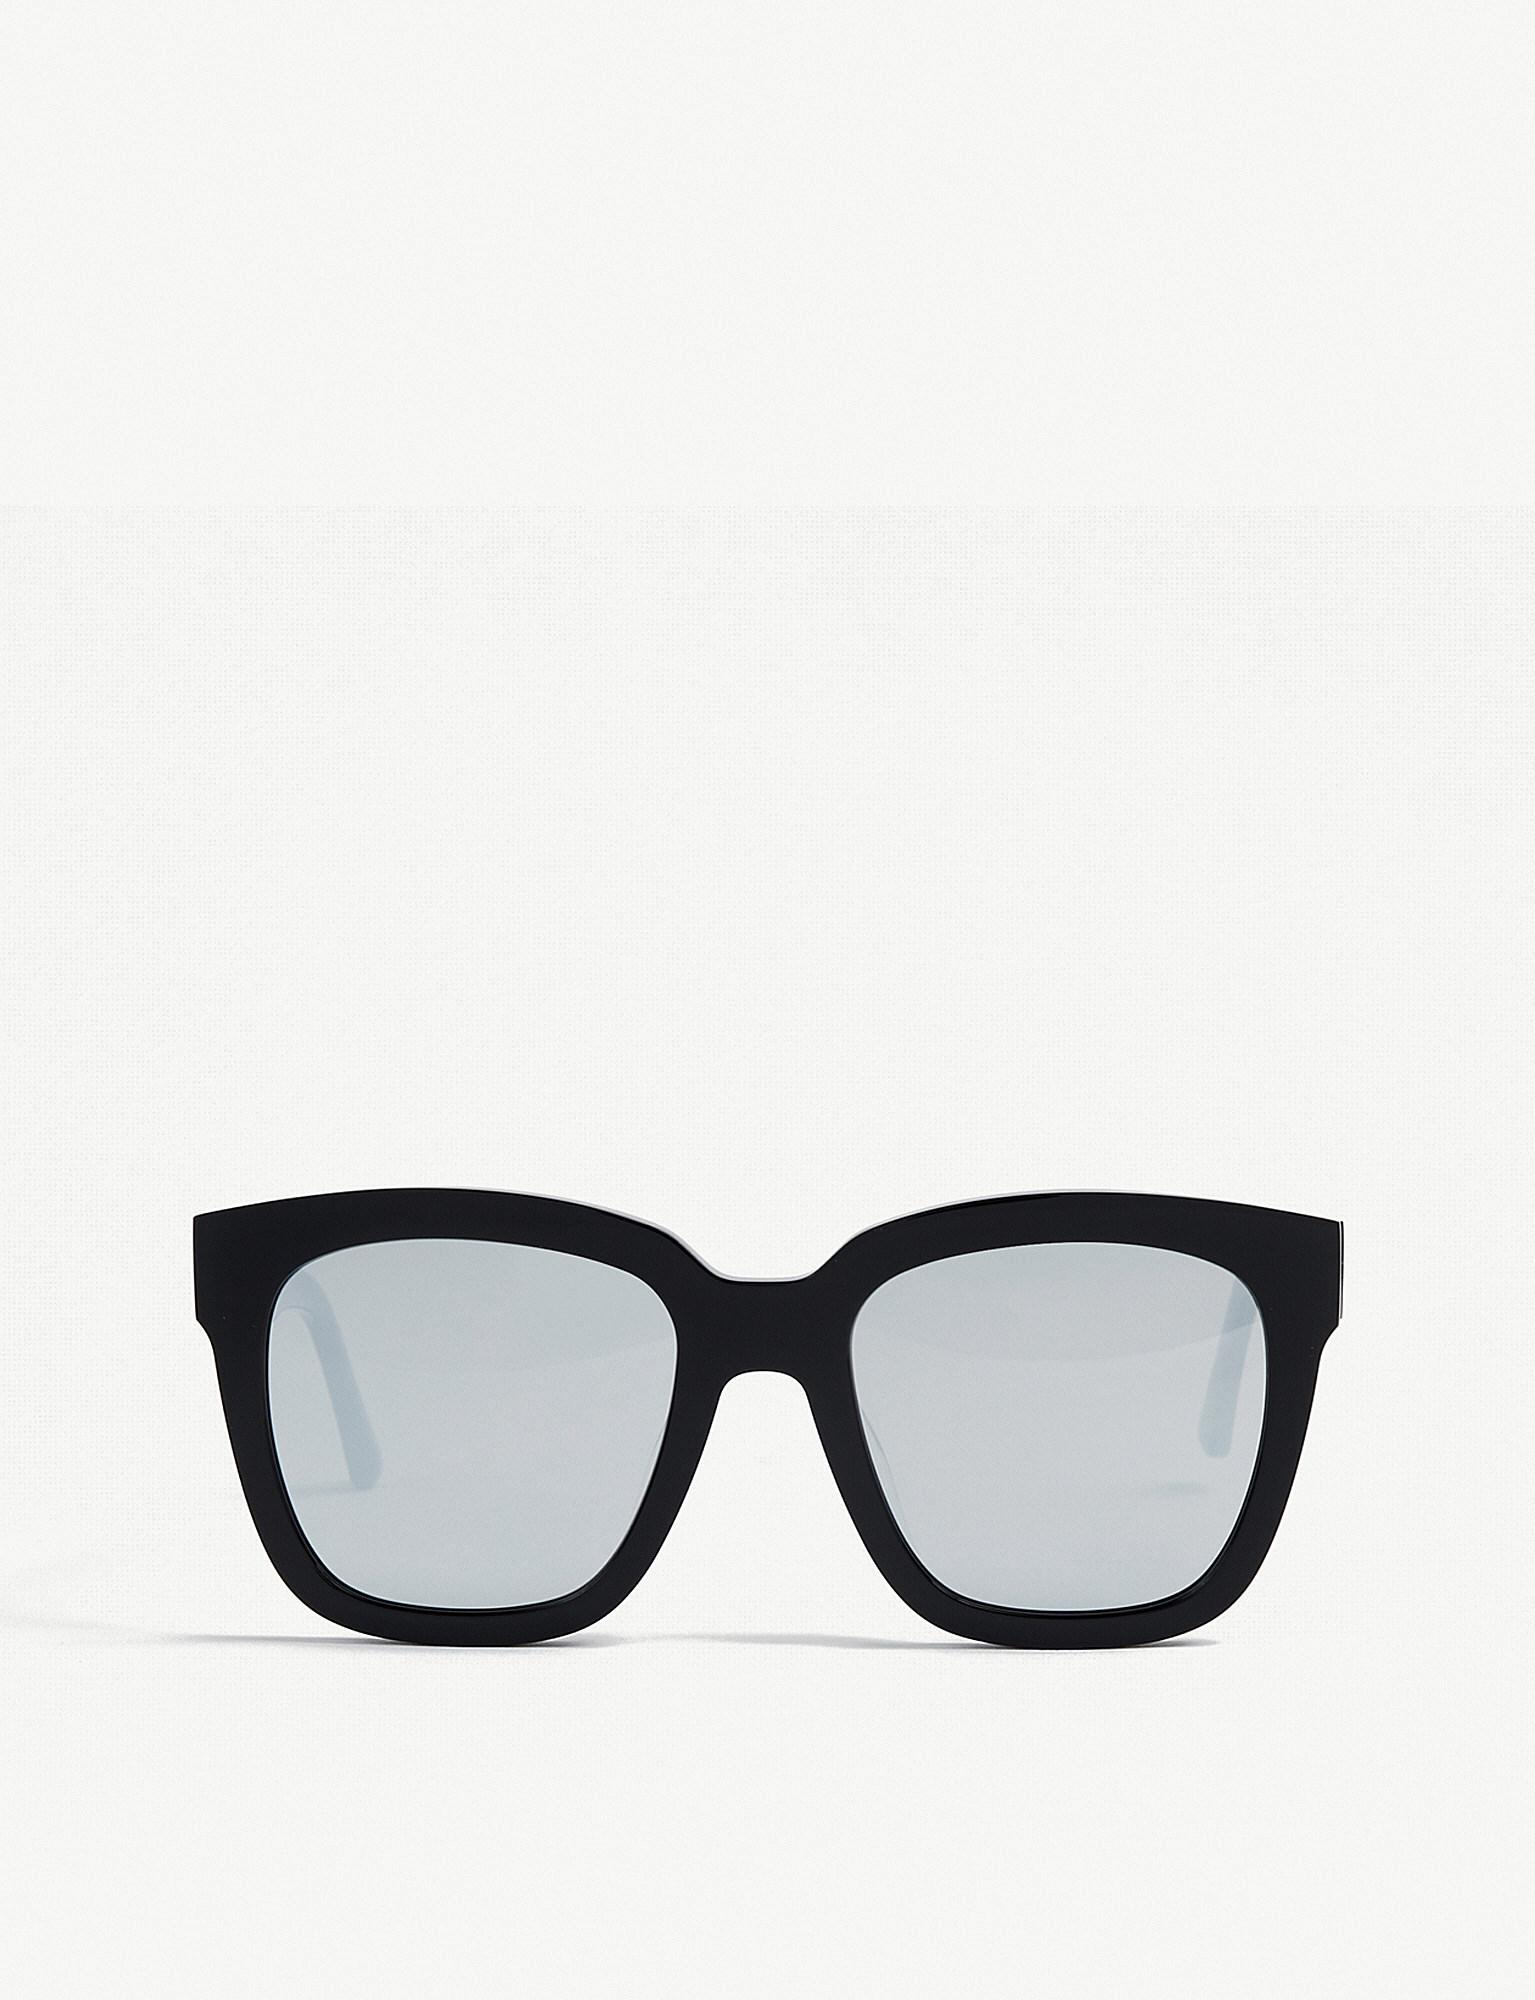 e8bc586692 Gentle Monster Dreamer Hoff Mirrored Acetate Sunglasses in Black - Lyst